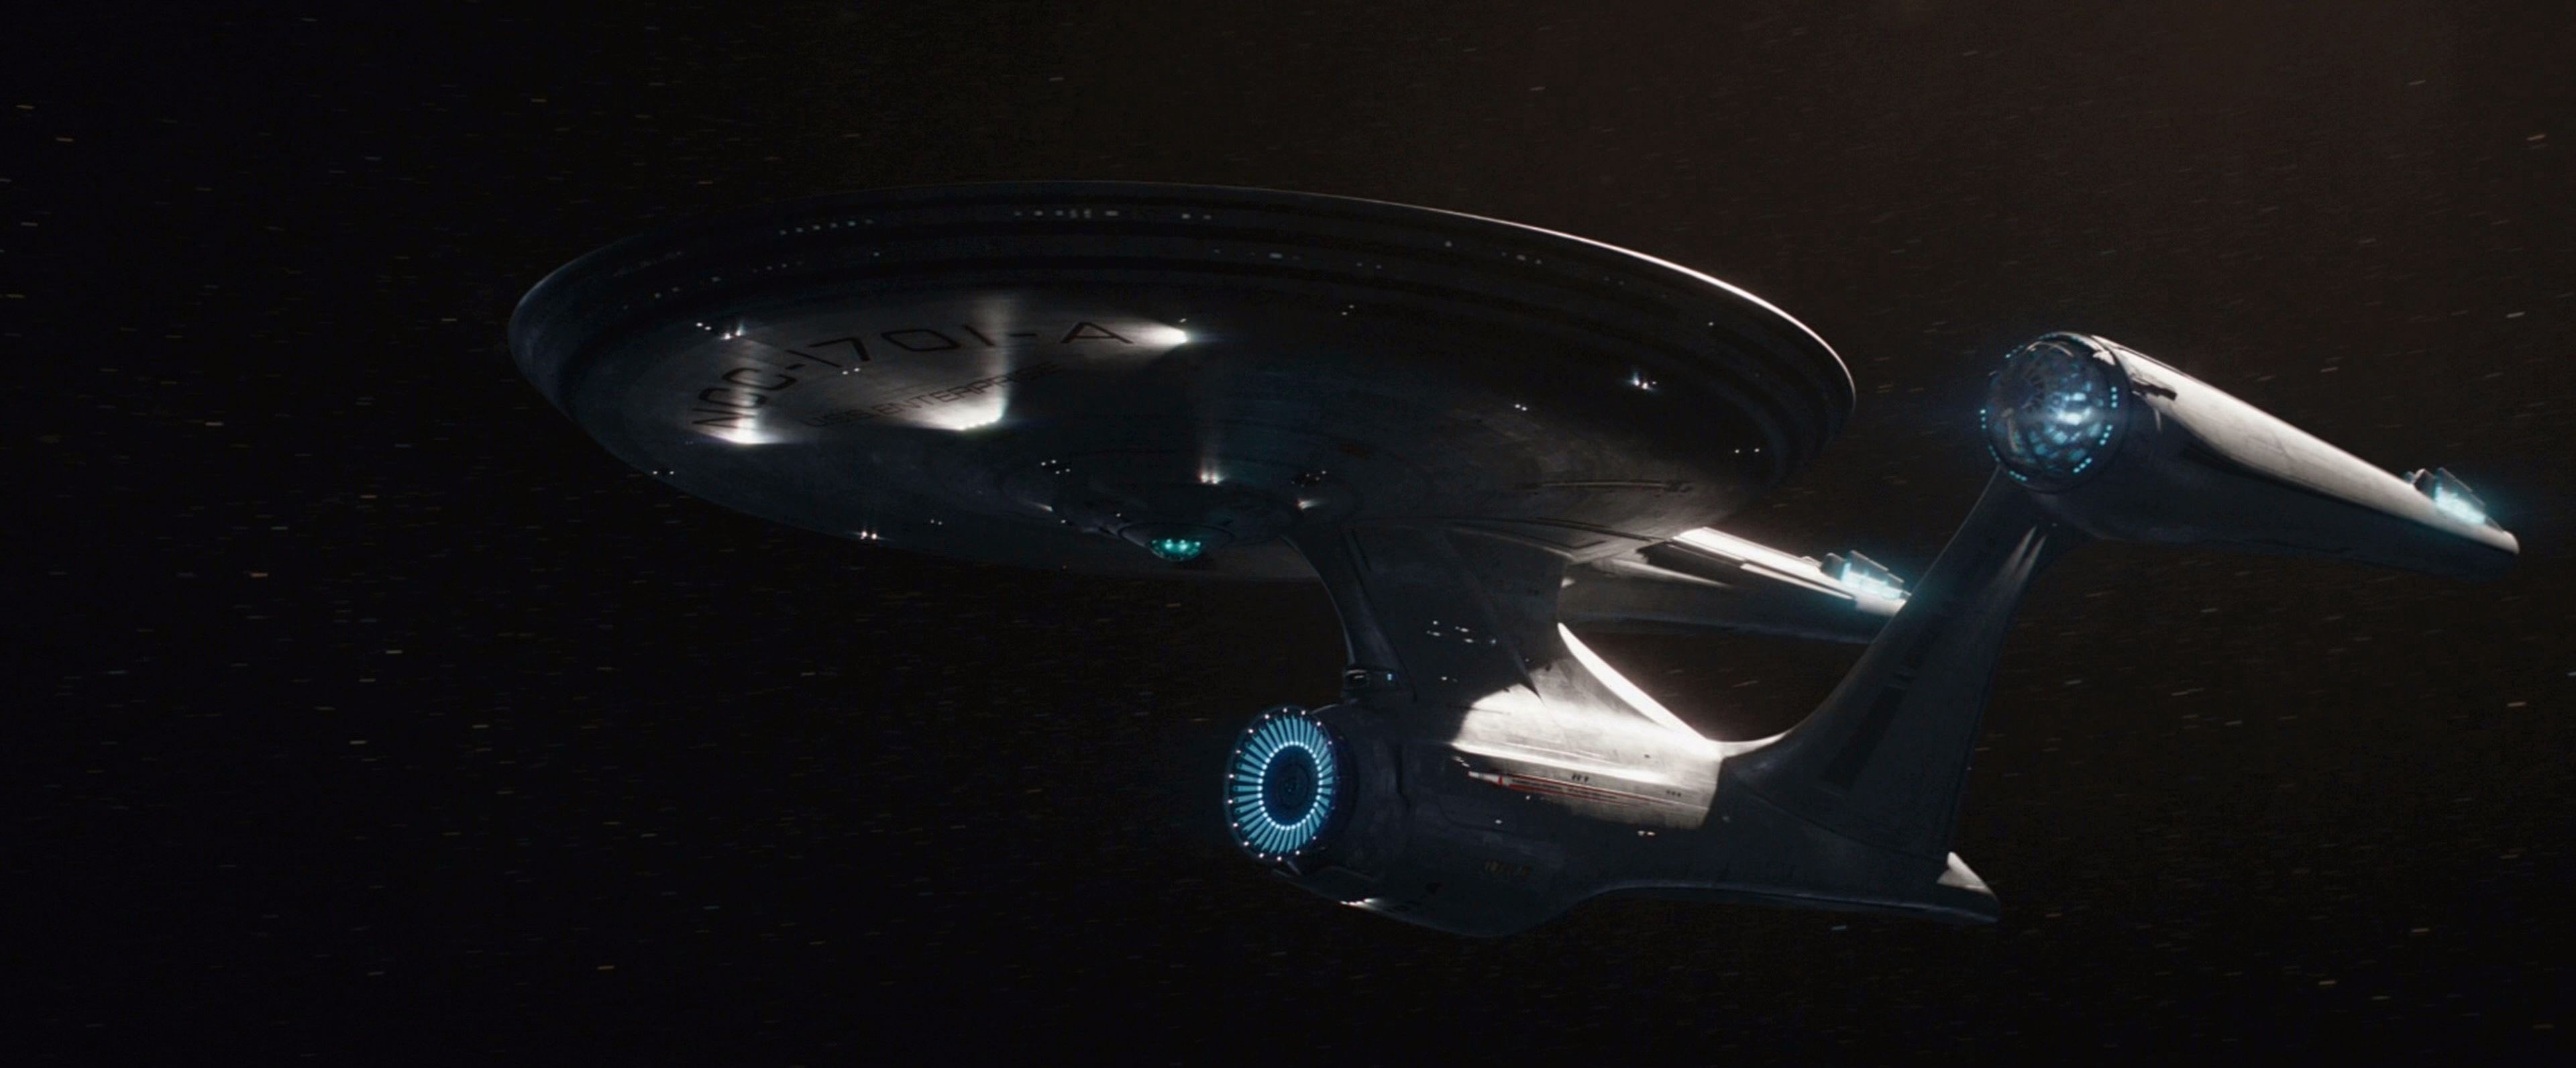 uss enterprise ncc 1701 a alternate reality memory alpha